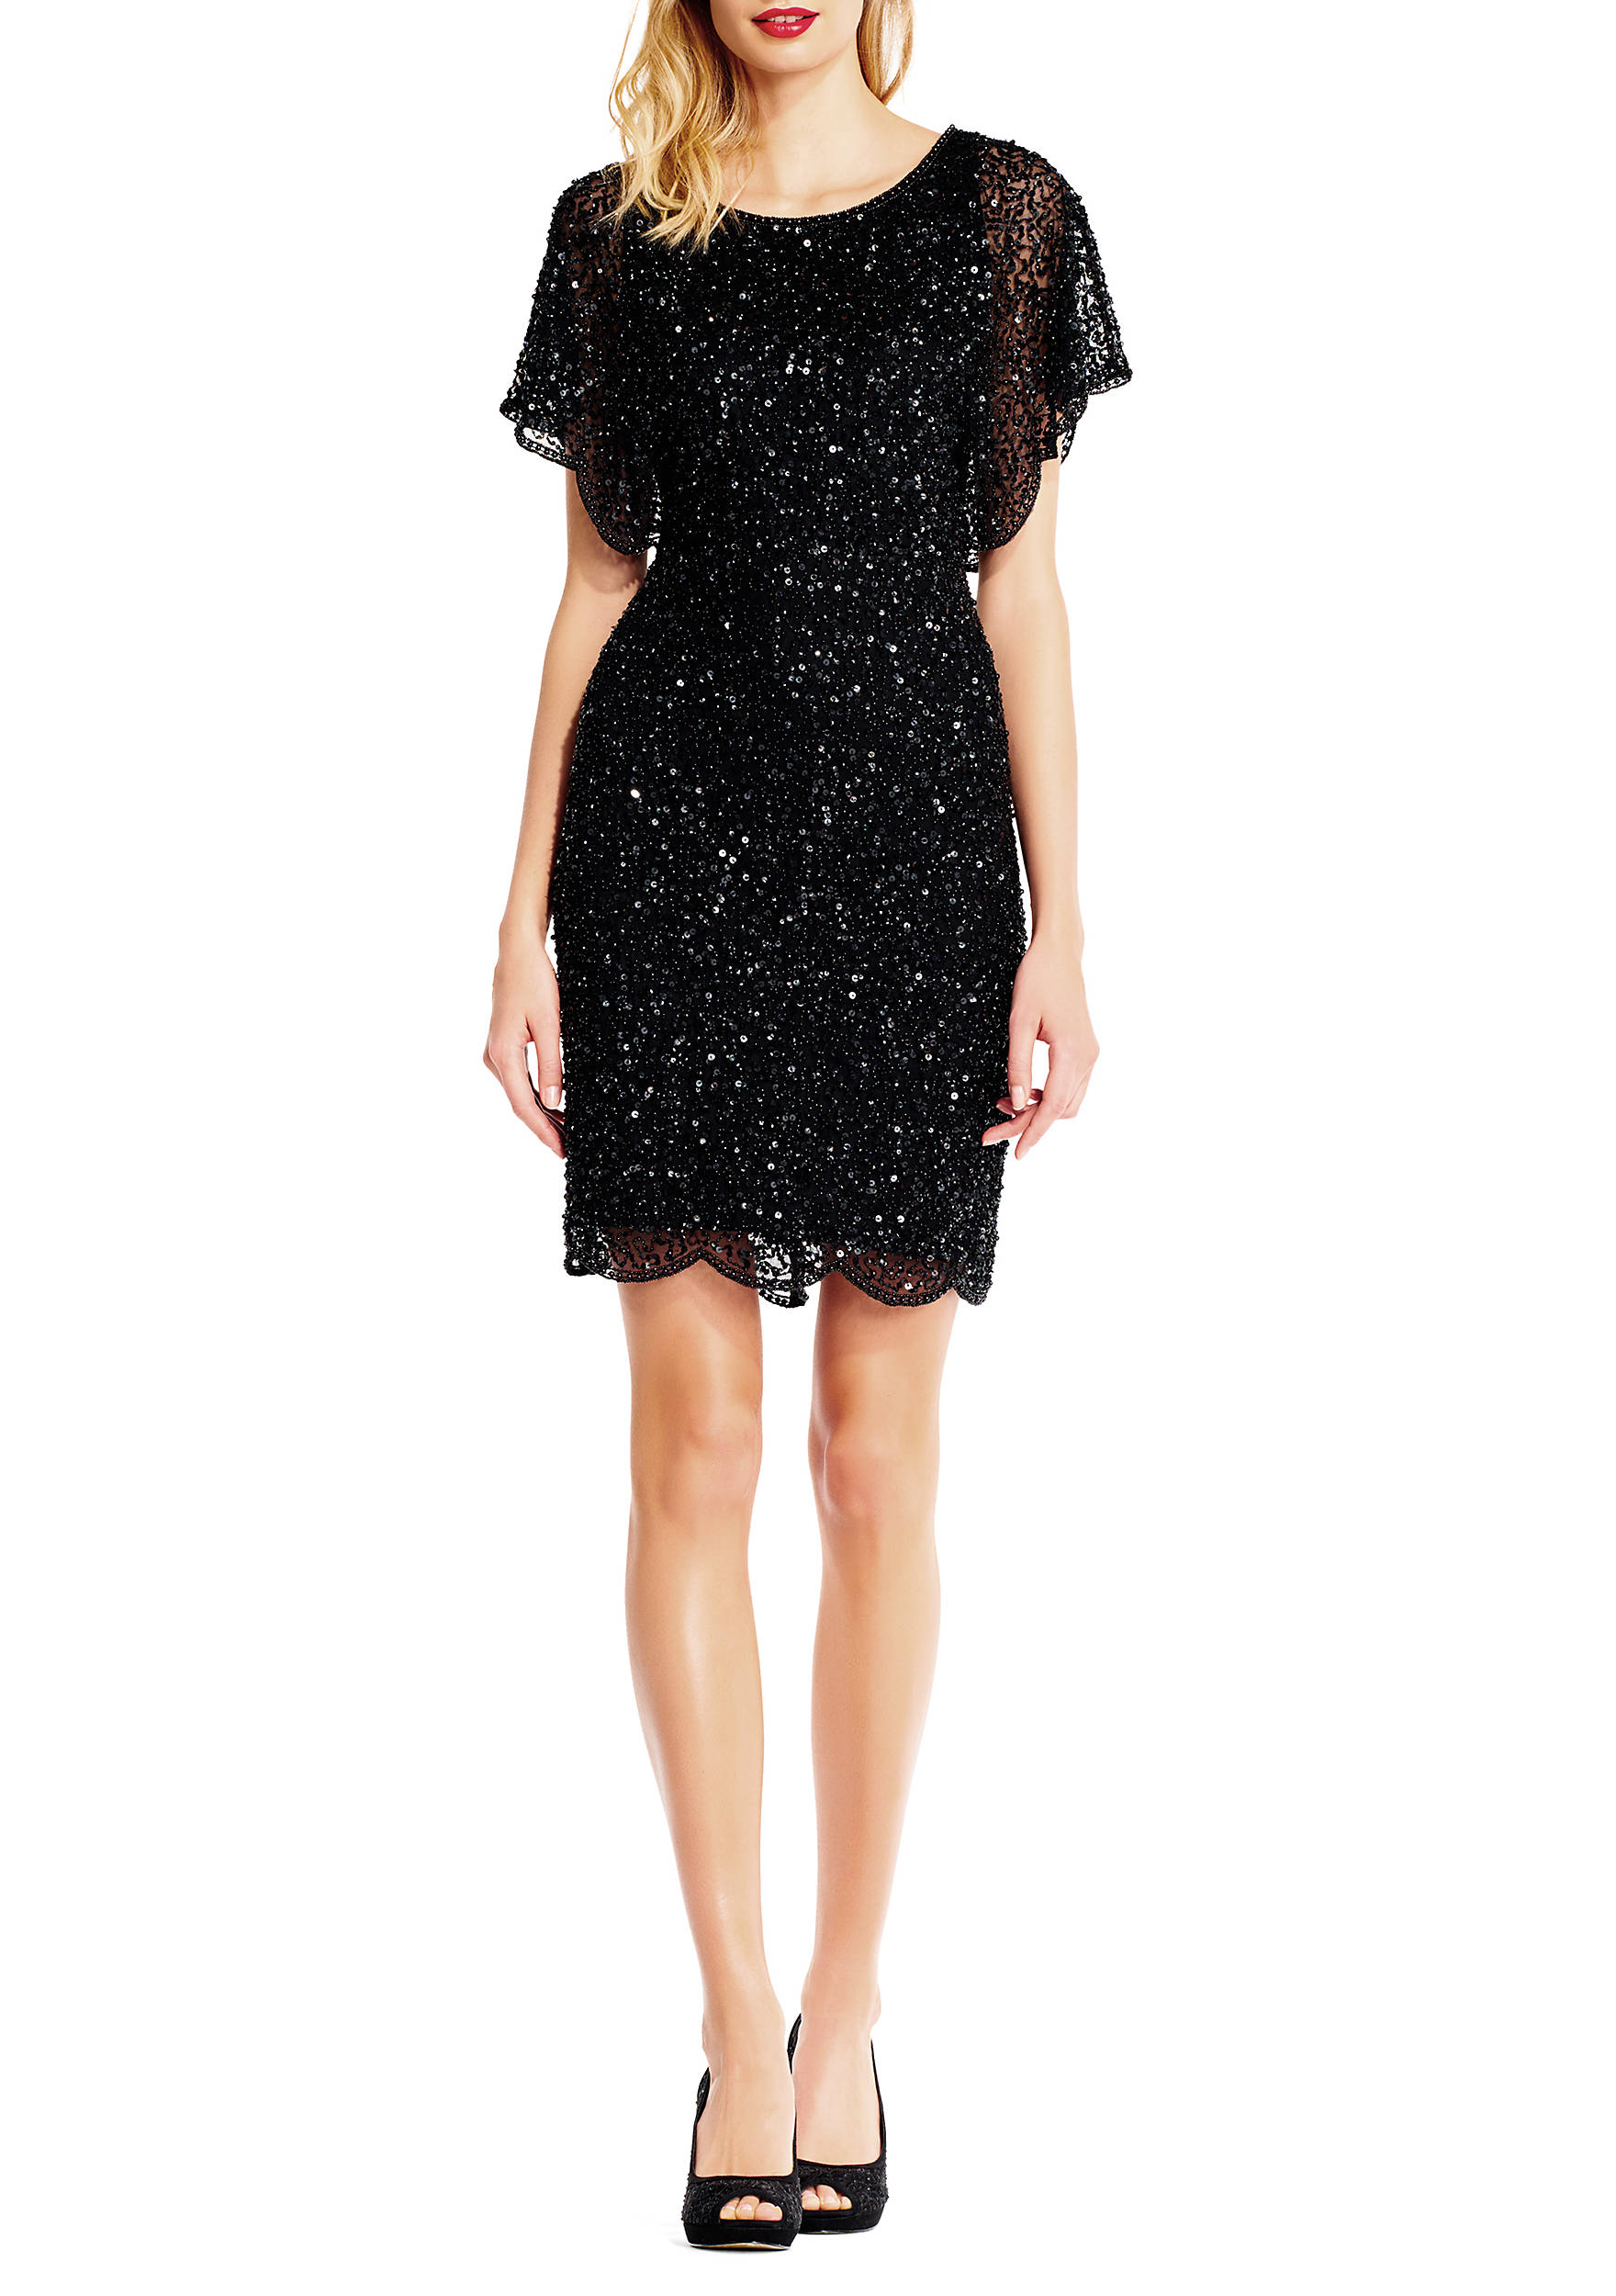 Adrianna papell sparkle dolman dress belk images ombrellifo Choice Image